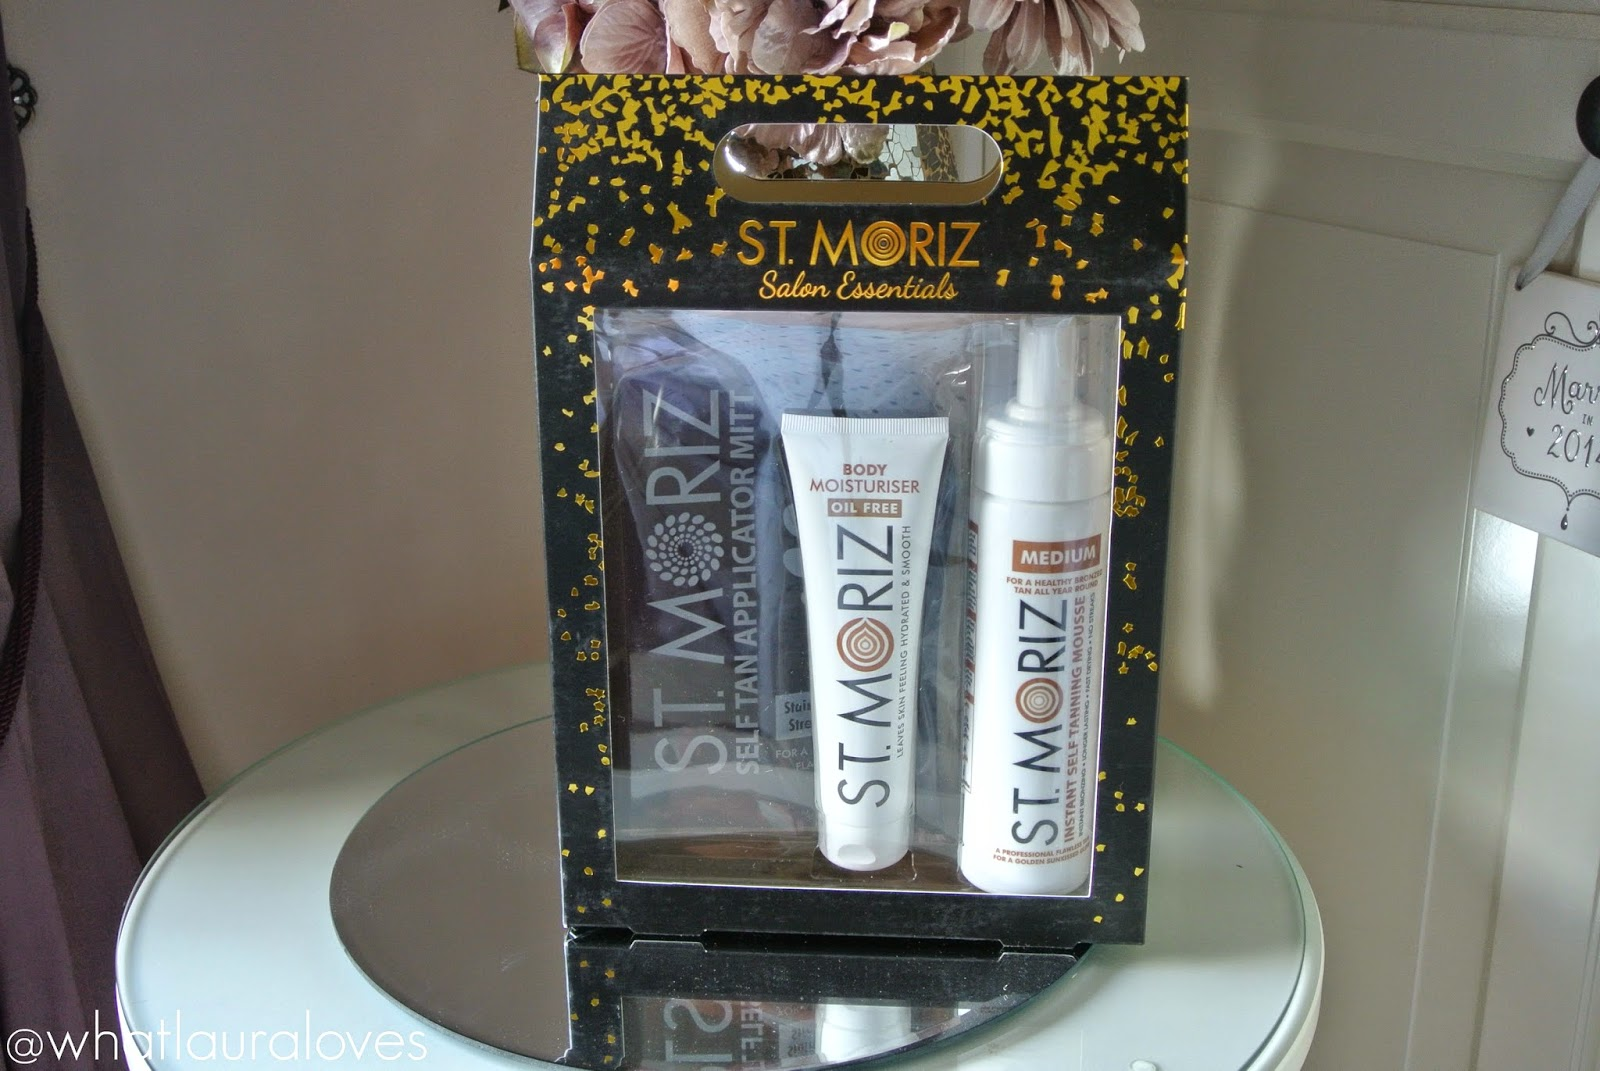 St Moriz Tanning Gift Set Last Minute Cheap Christmas Gift Present